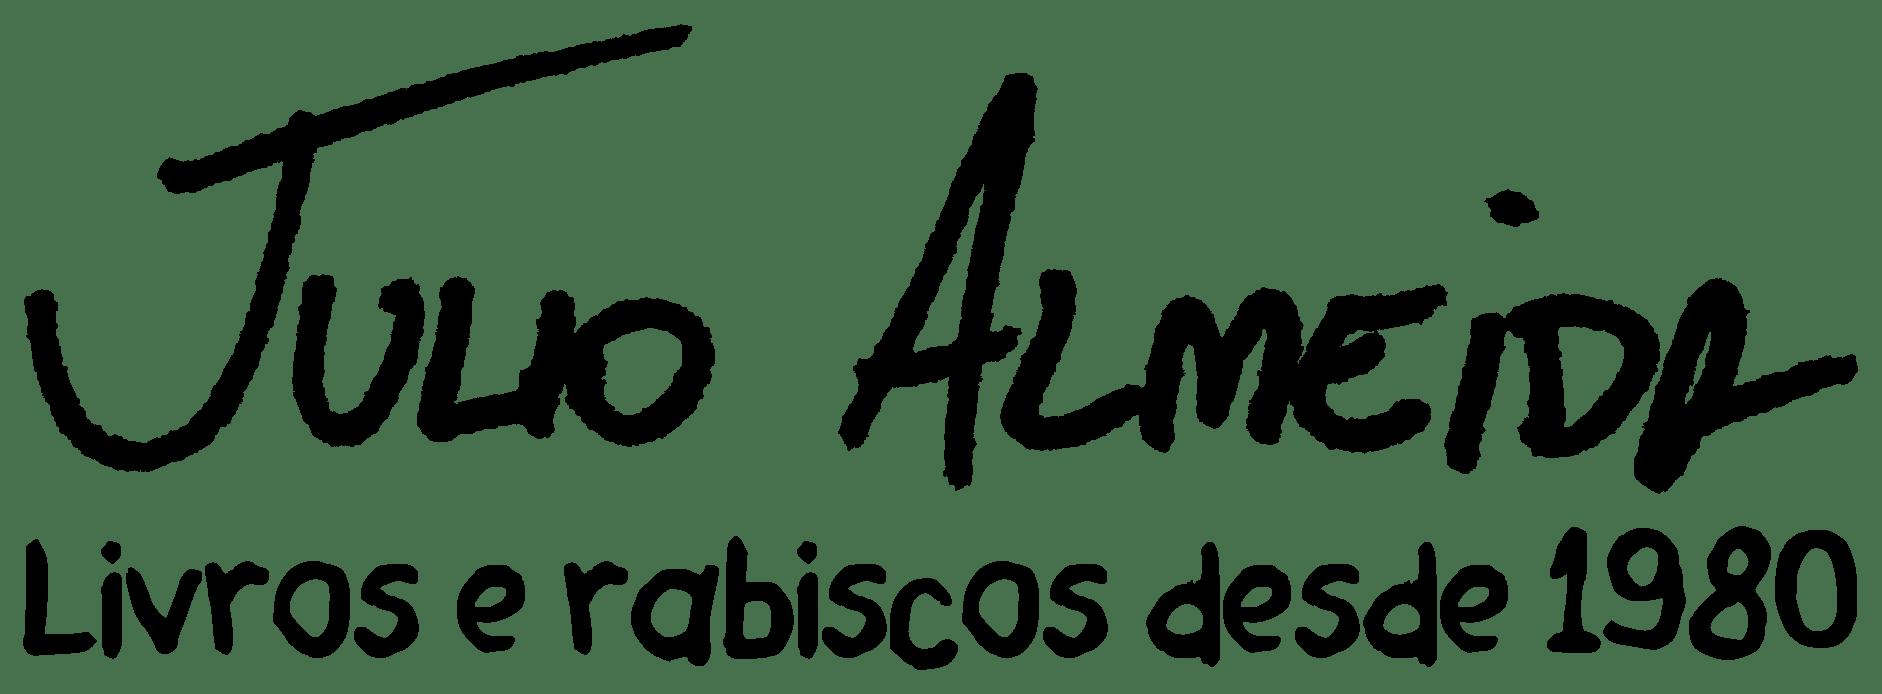 Julio Almeida